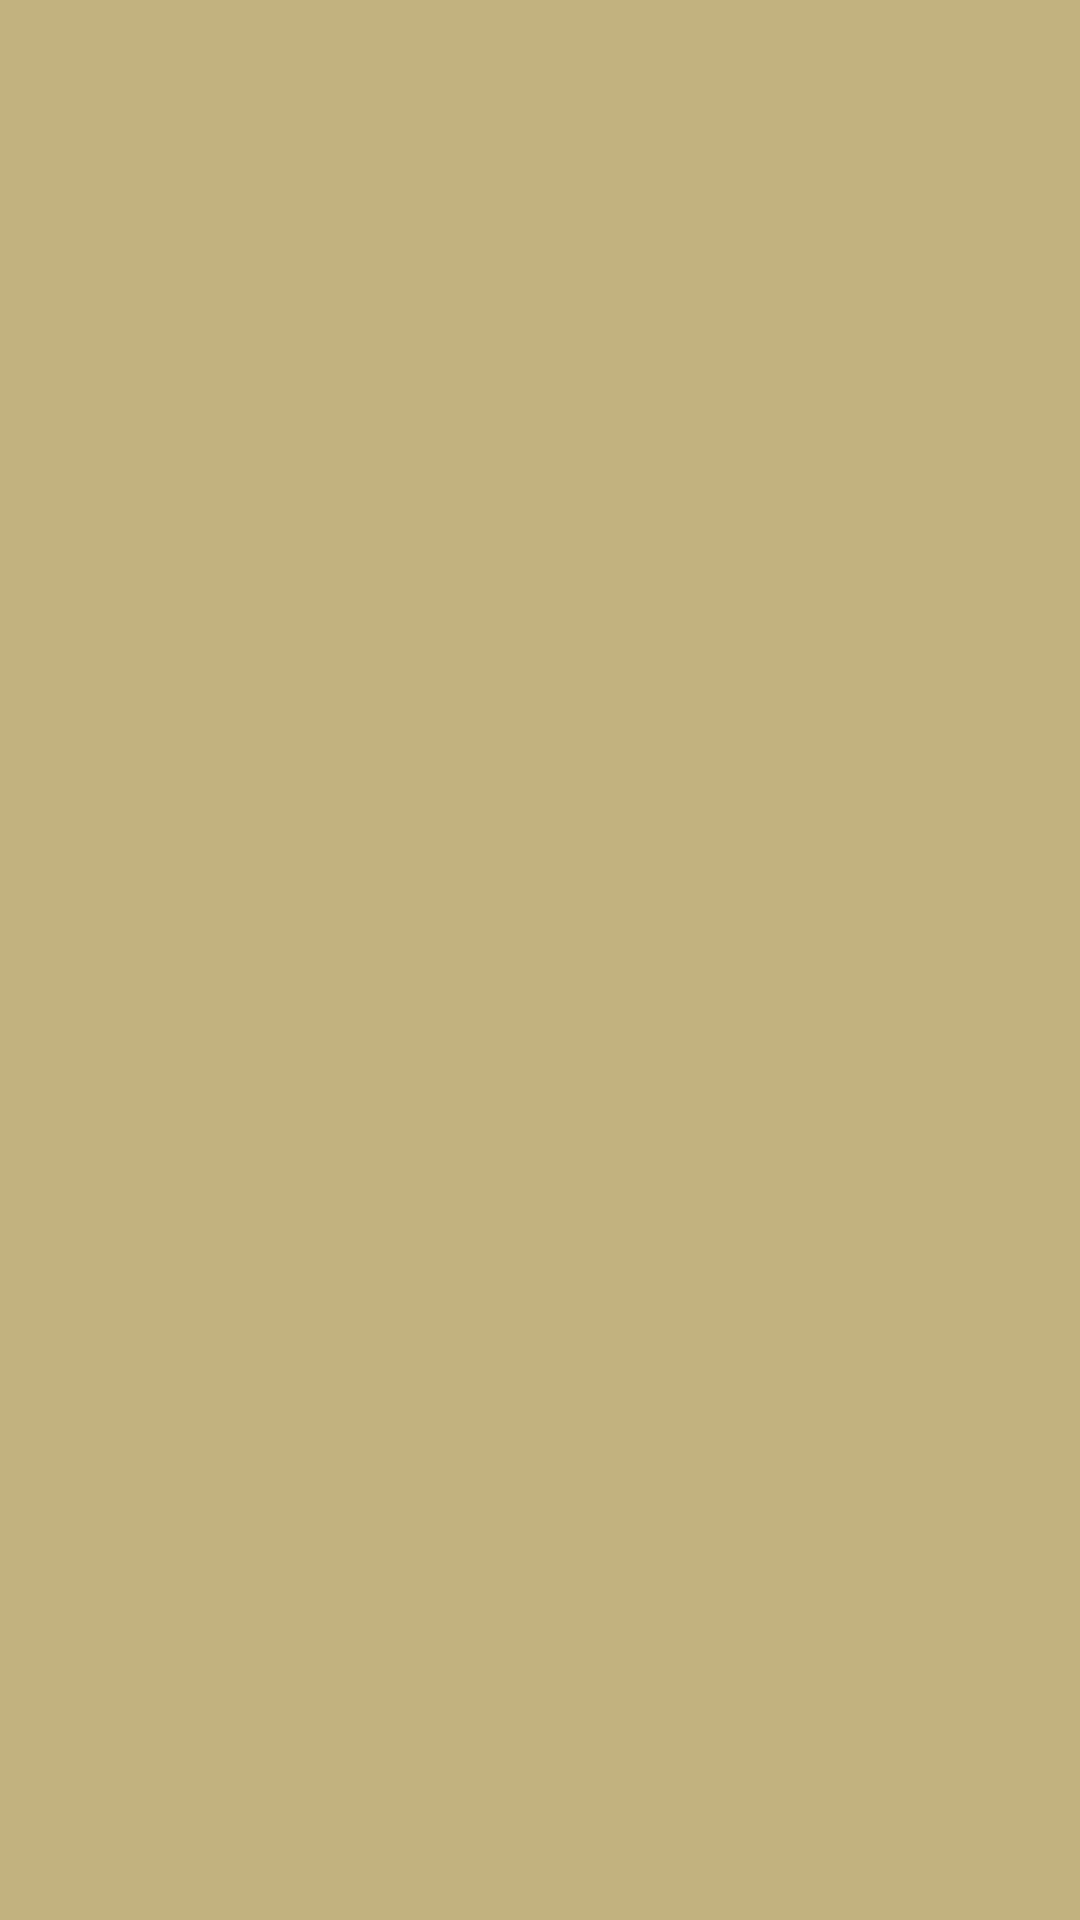 1080x1920 Ecru Solid Color Background